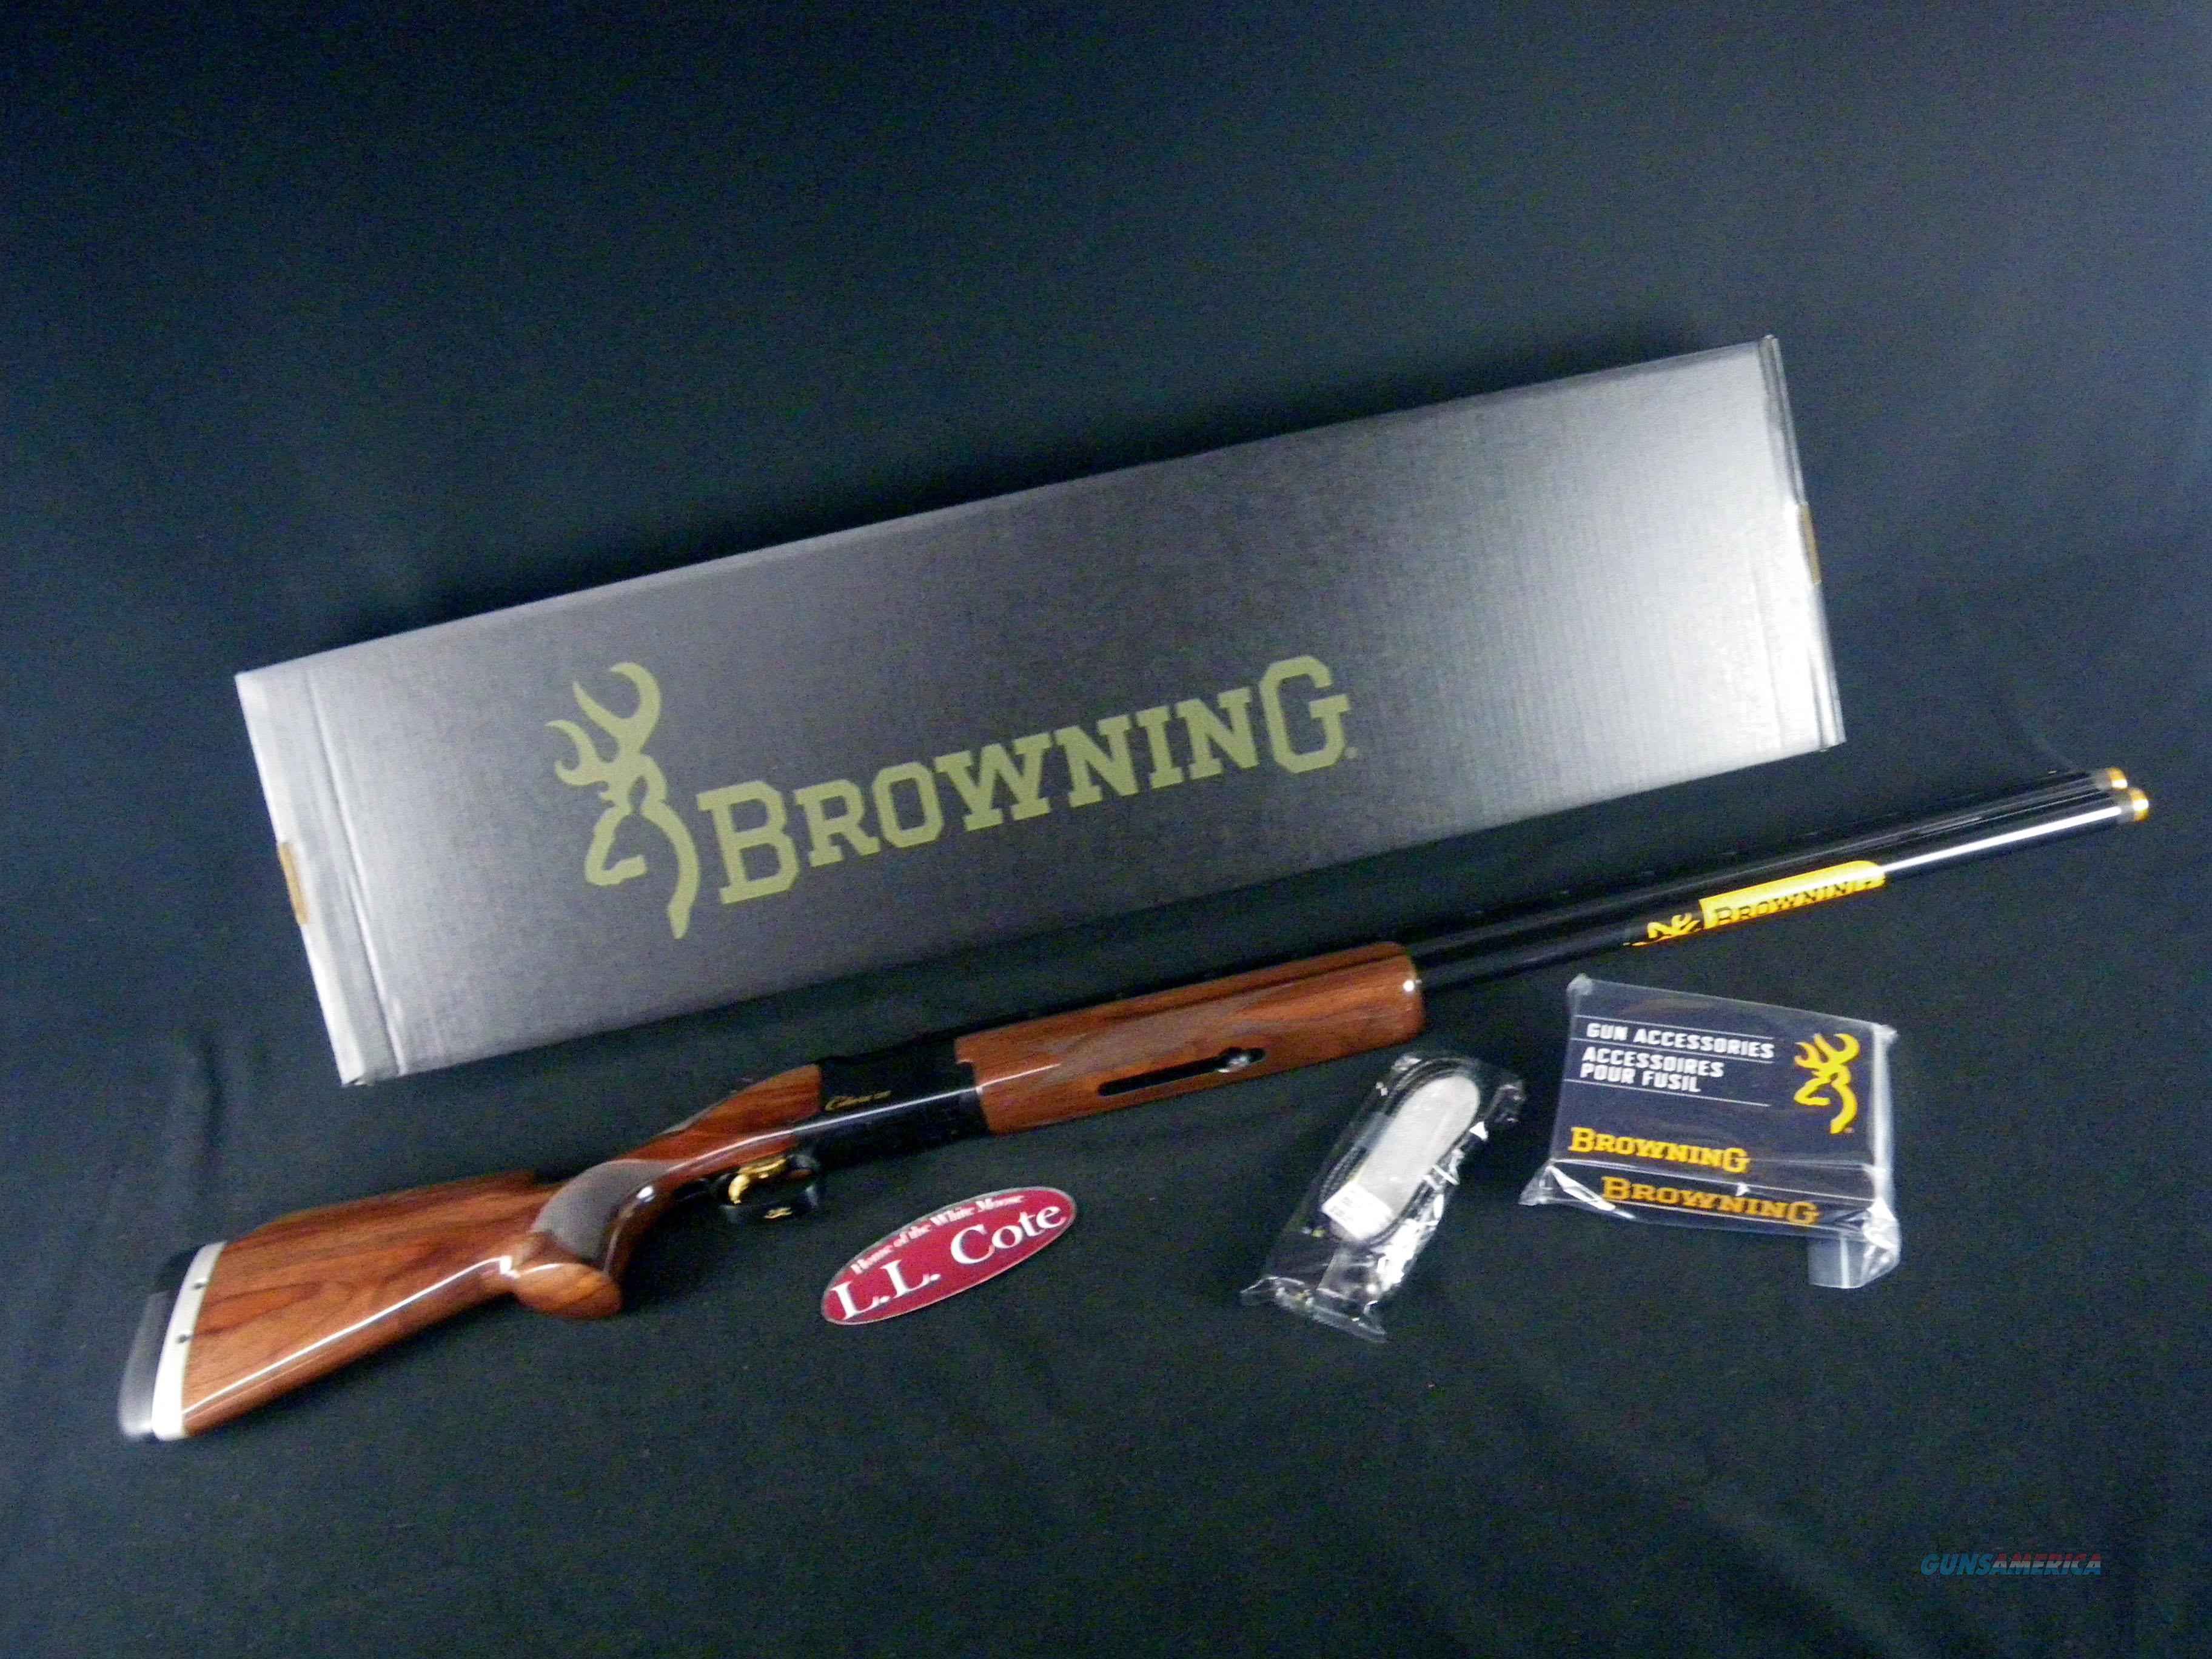 "Browning Citori CXT Micro Adj LOP 12ga 28"" NEW 3"" 018164328  Guns > Shotguns > Browning Shotguns > Over Unders > Citori > Hunting"